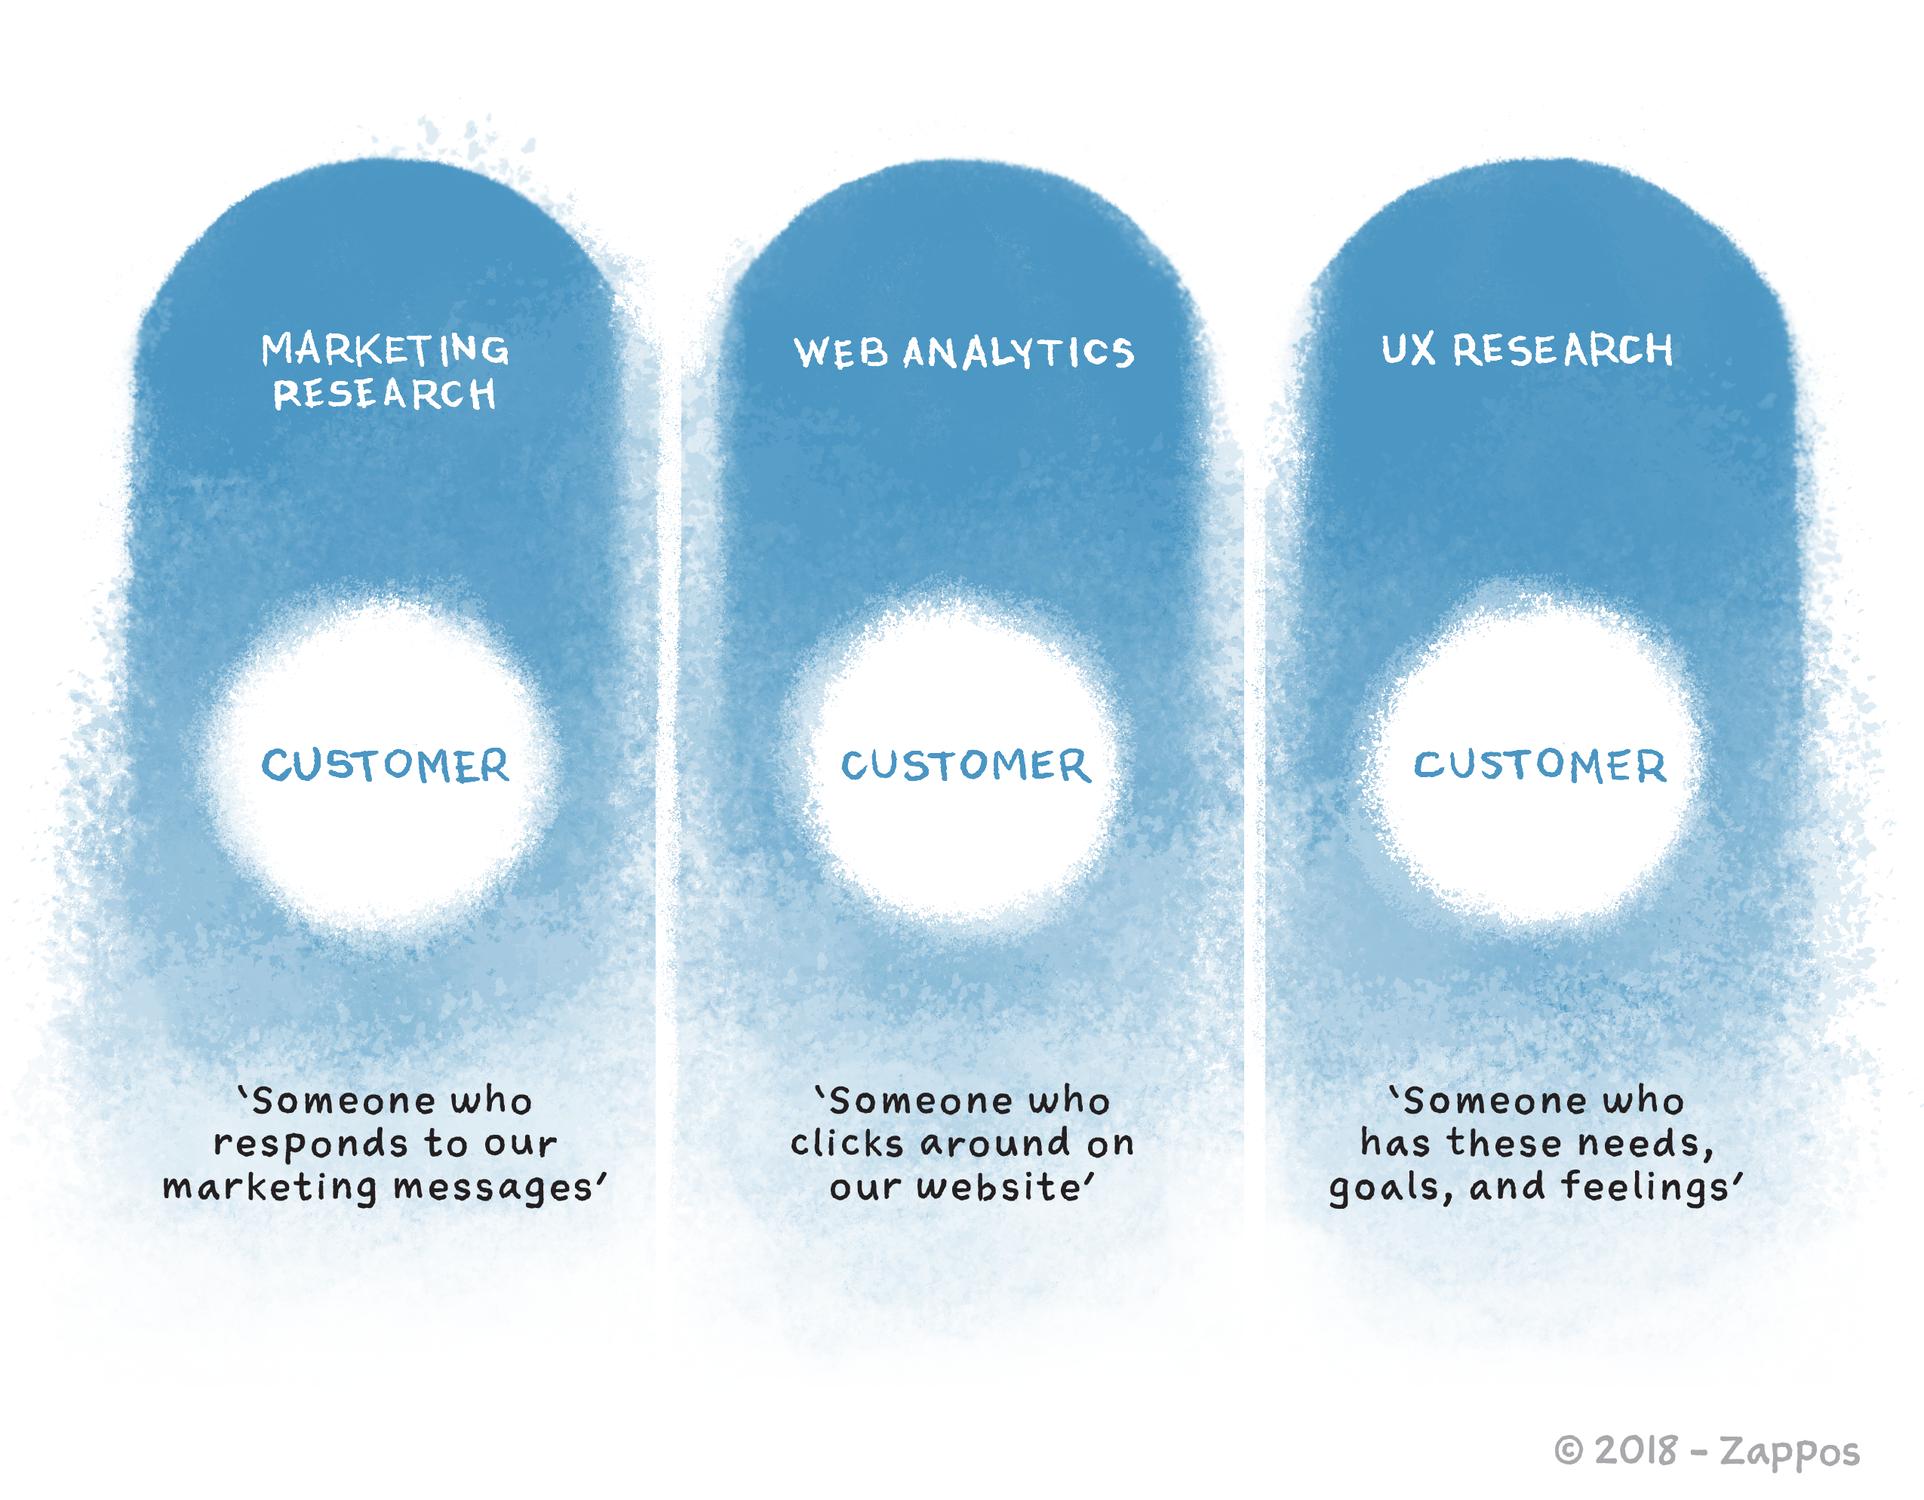 customer research teams